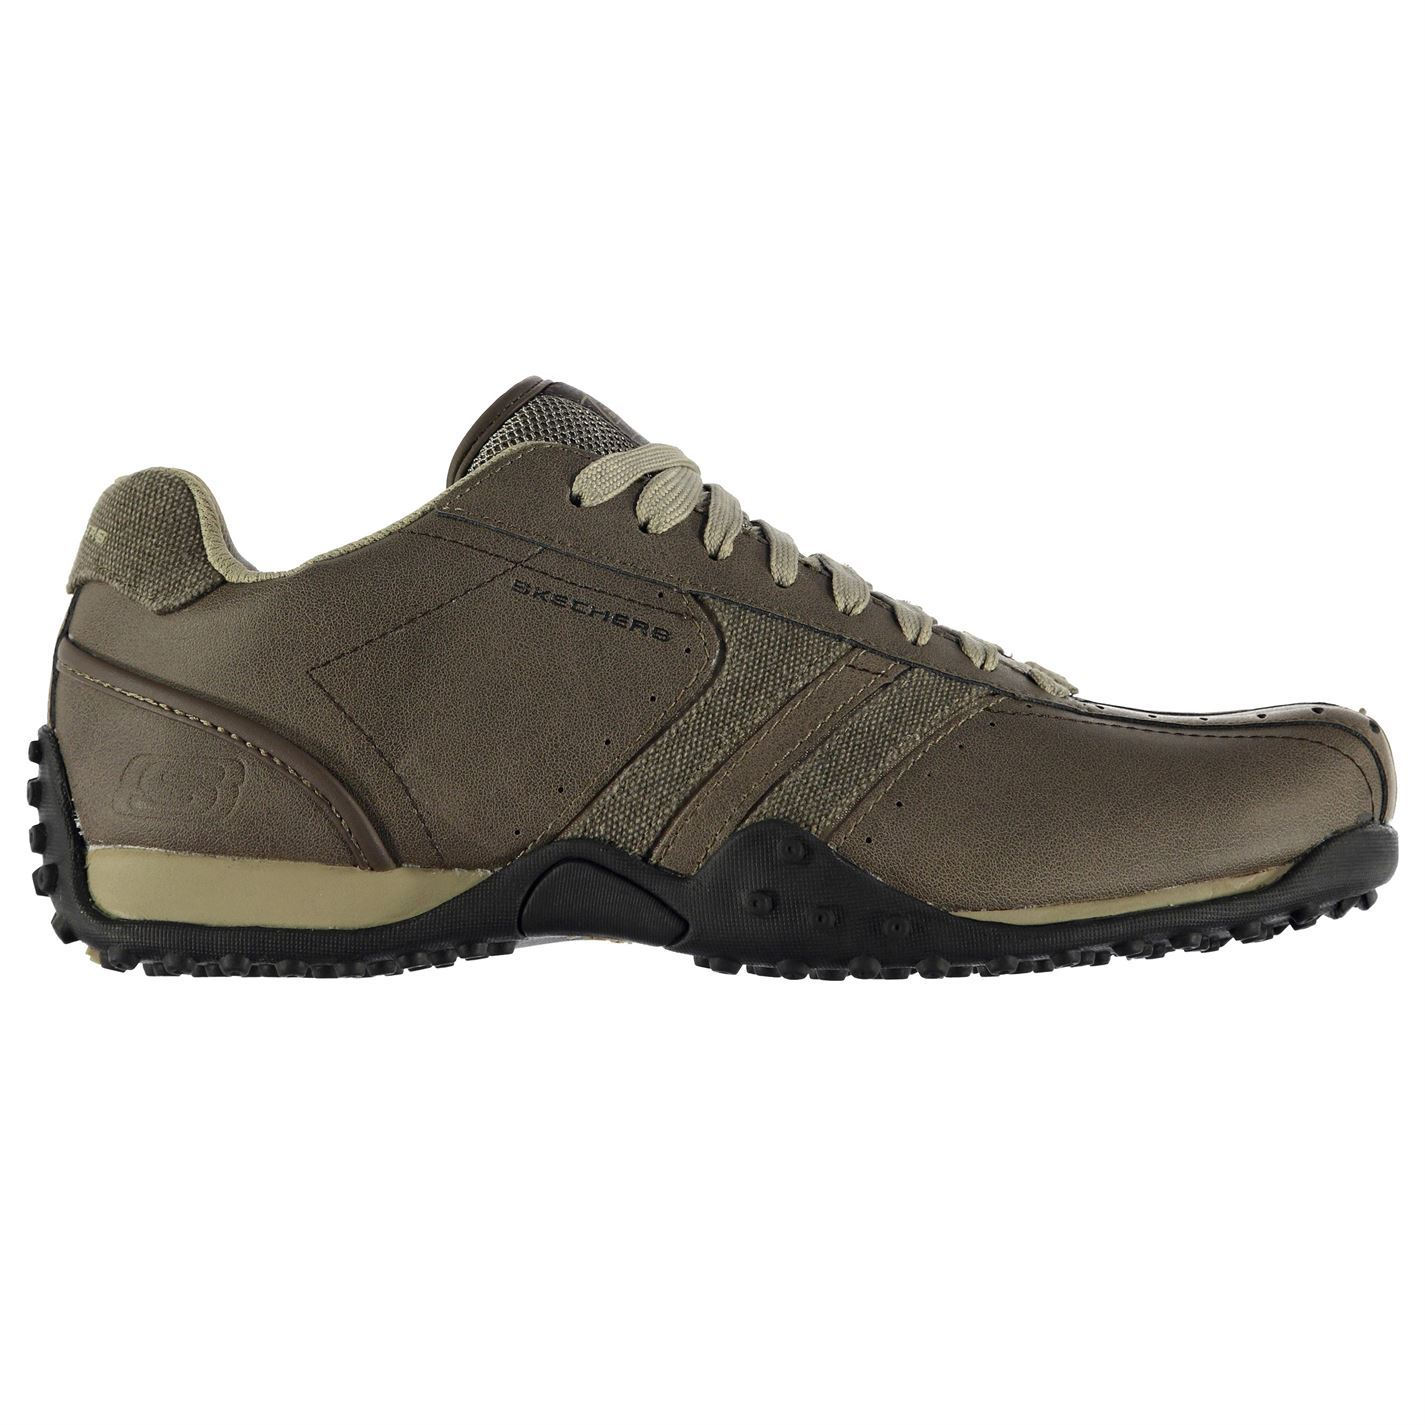 Skechers-Urban-Track-Forward-Trainers-Mens-Athleisure-Footwear-Shoes-Sneakers thumbnail 17